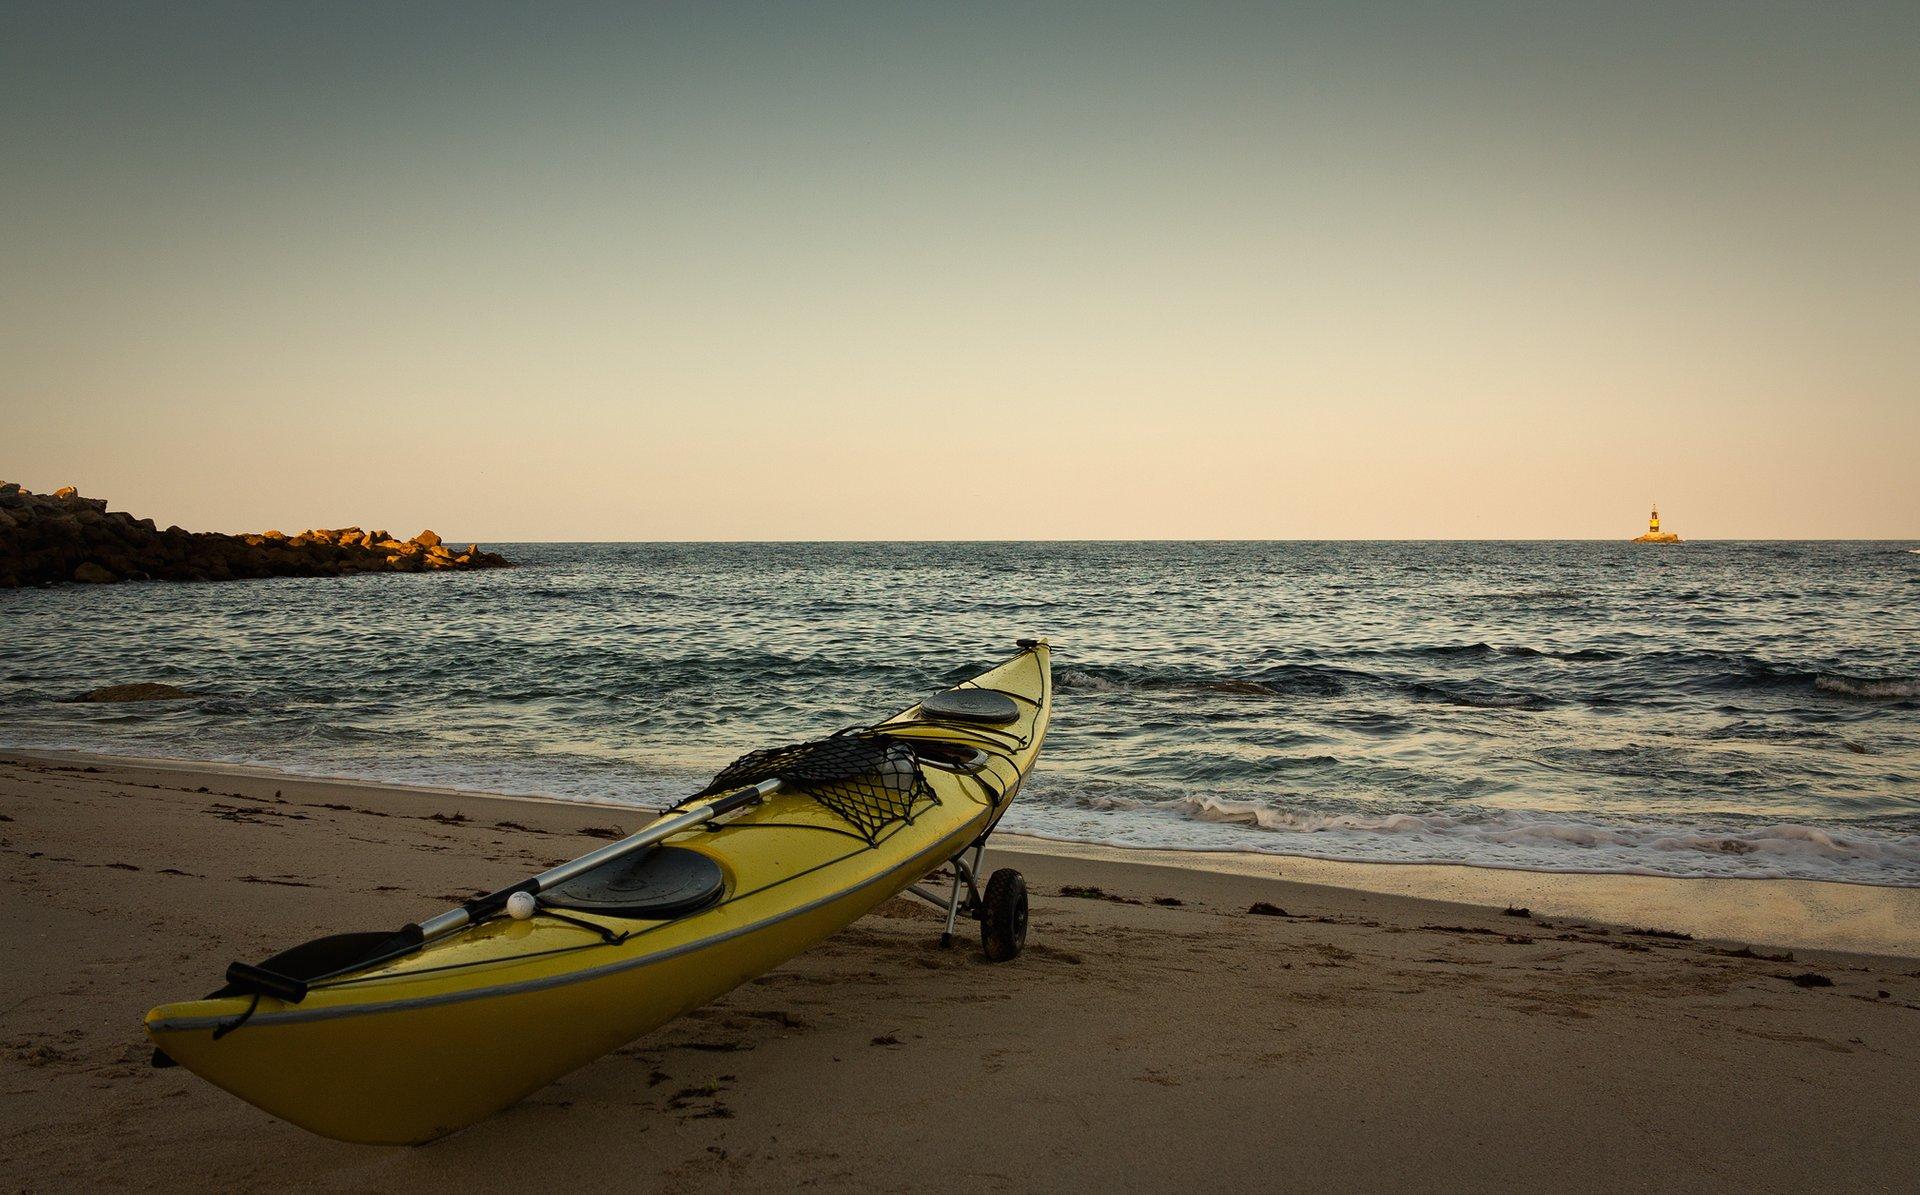 Kayaking in Galicia in Spain - Best Time